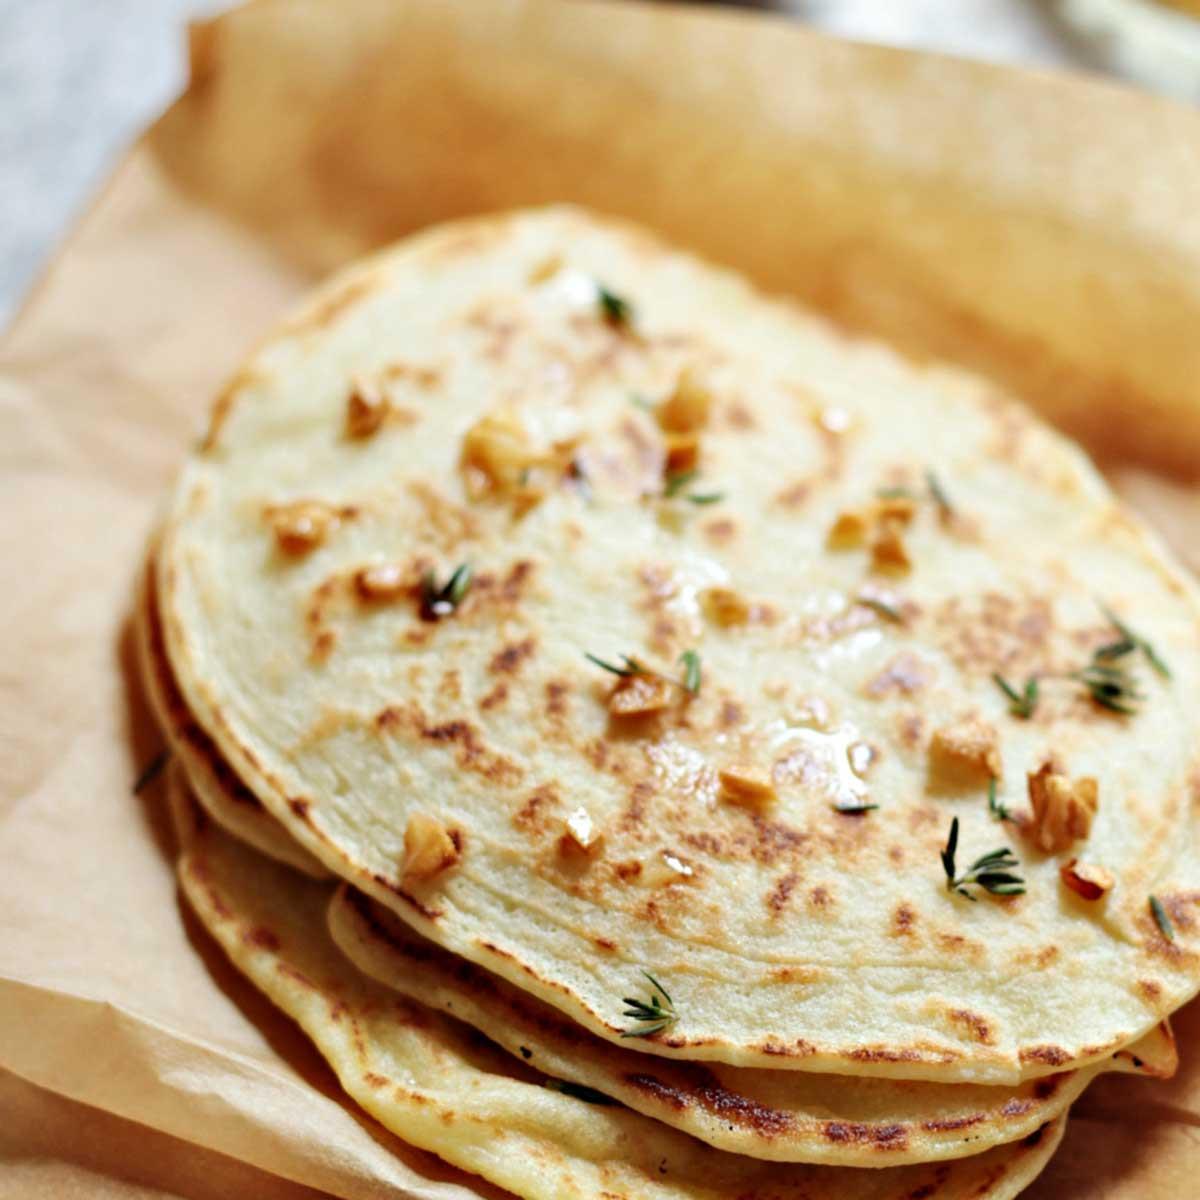 Recipes For Nan Bread  Paleo Garlic Naan Bread Quick and Easy Recipe